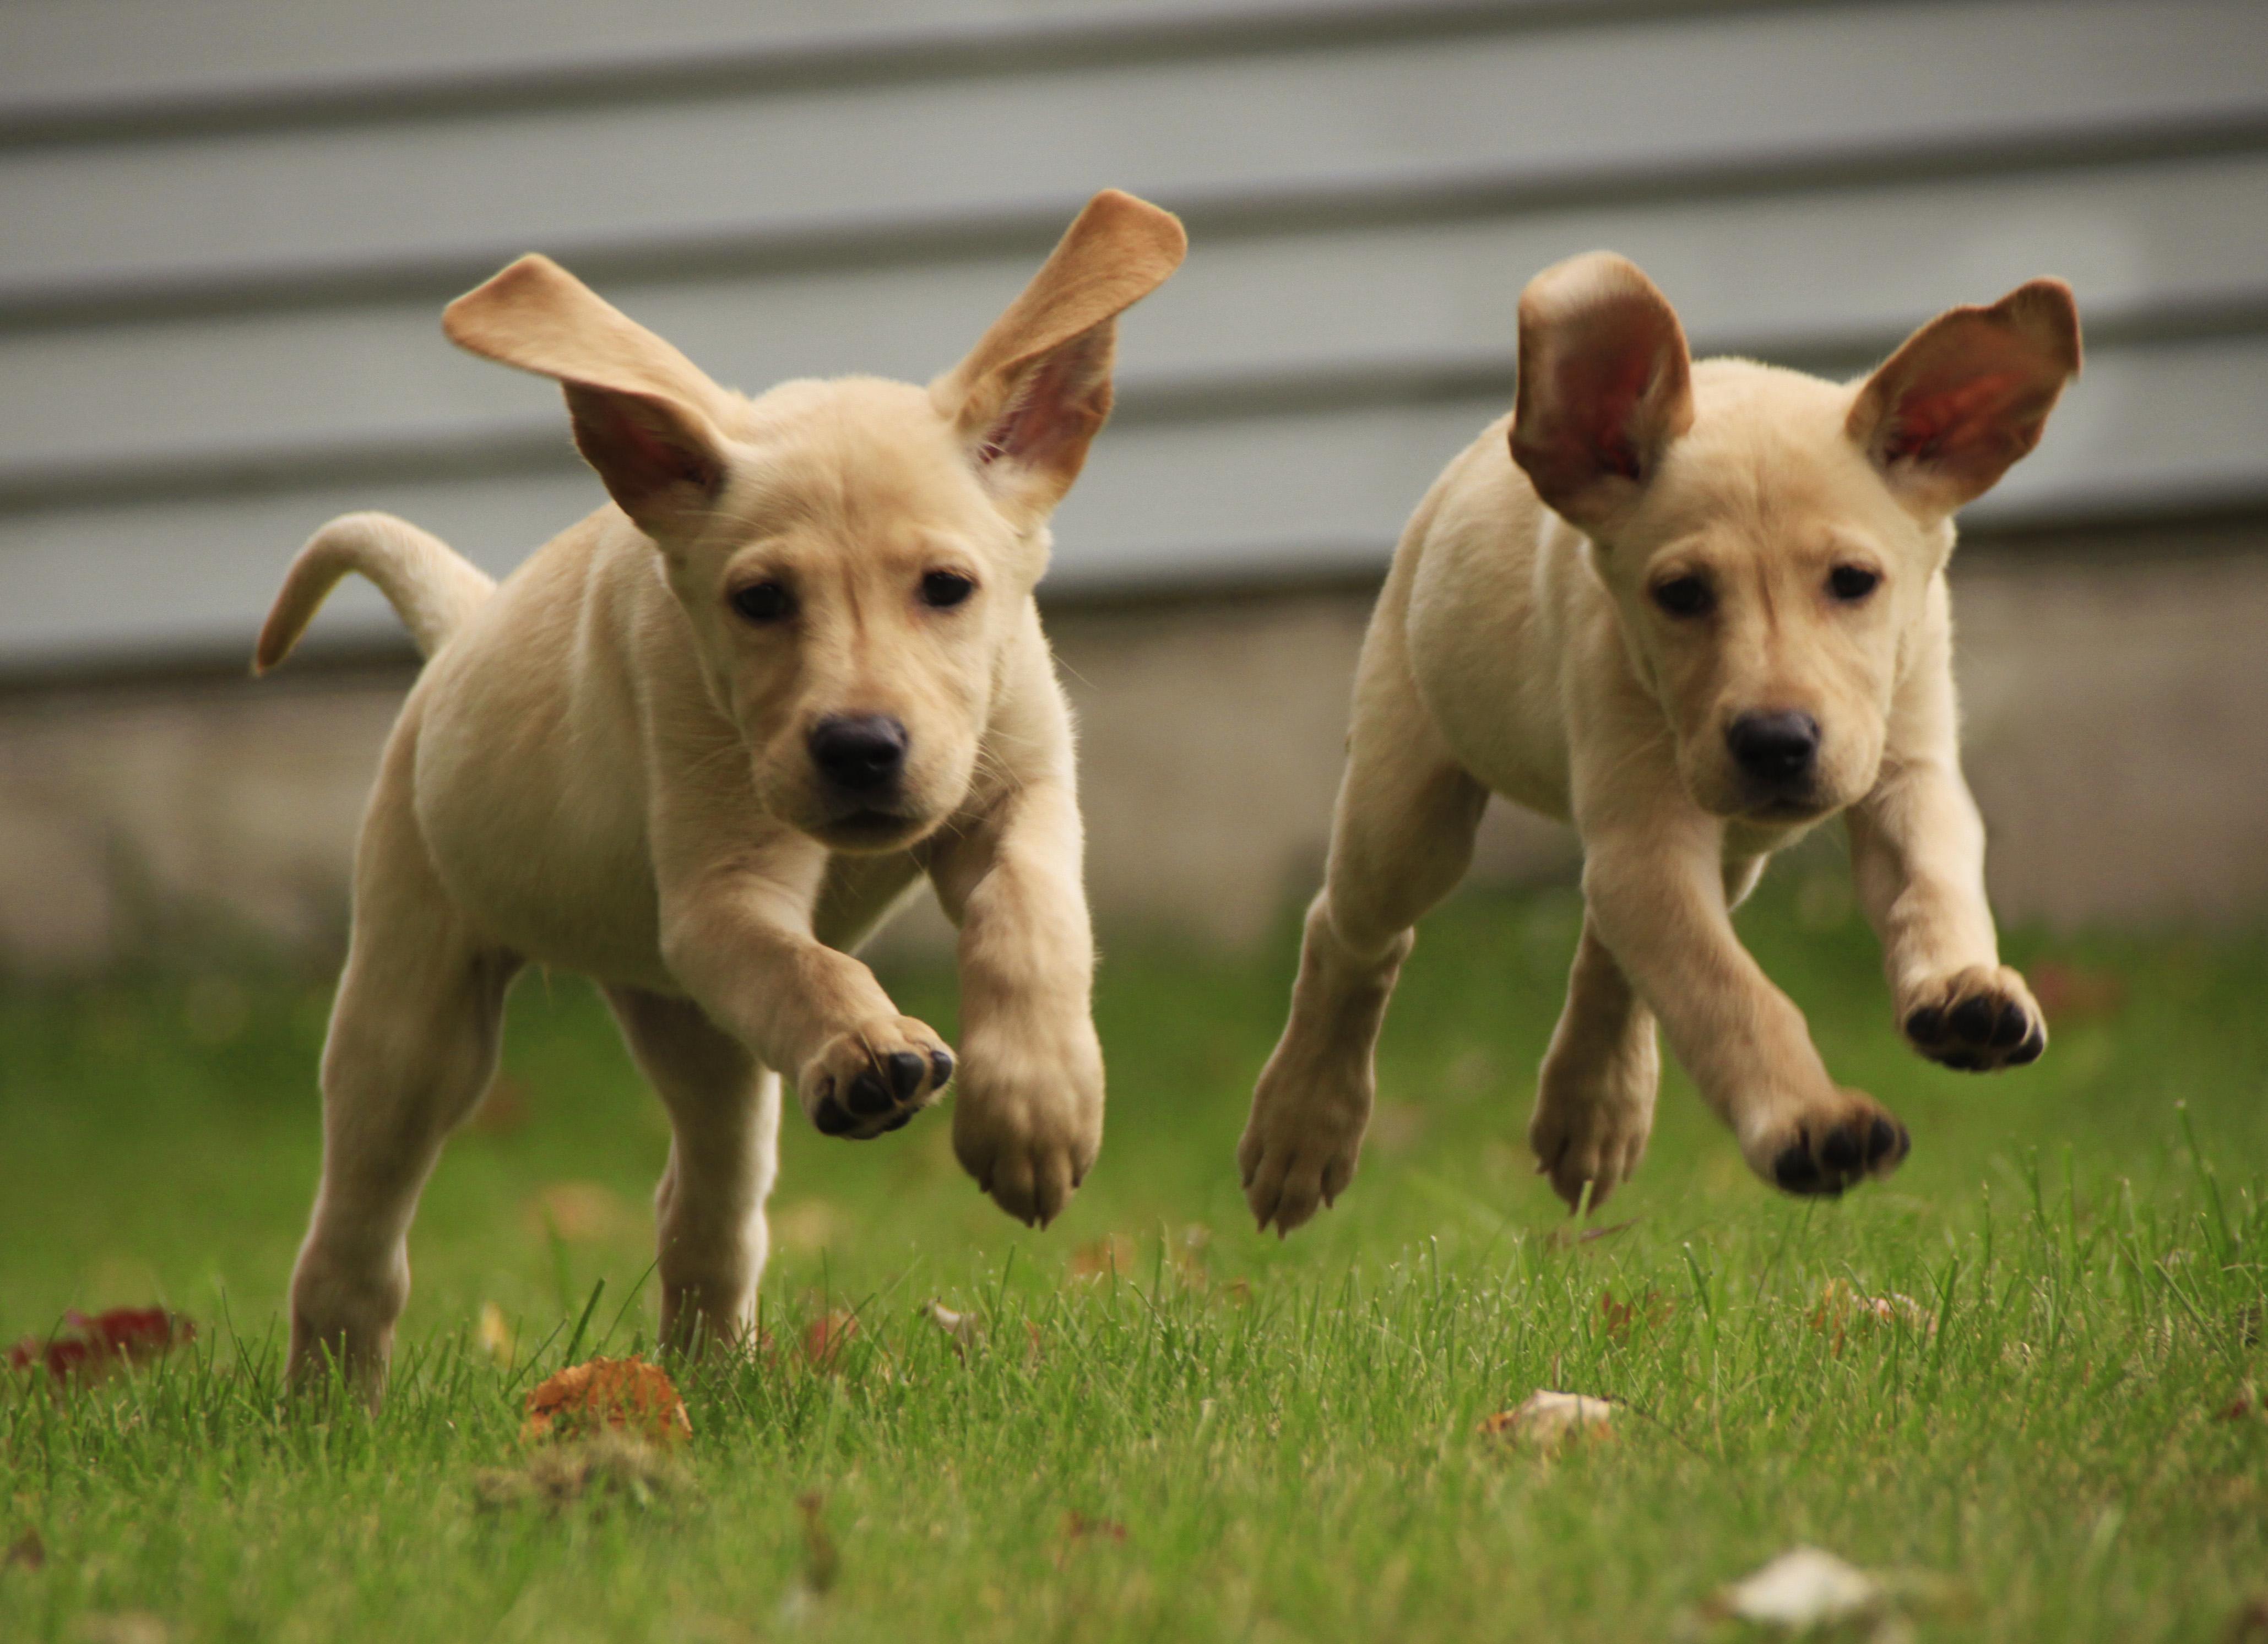 Yellow labrador puppies running